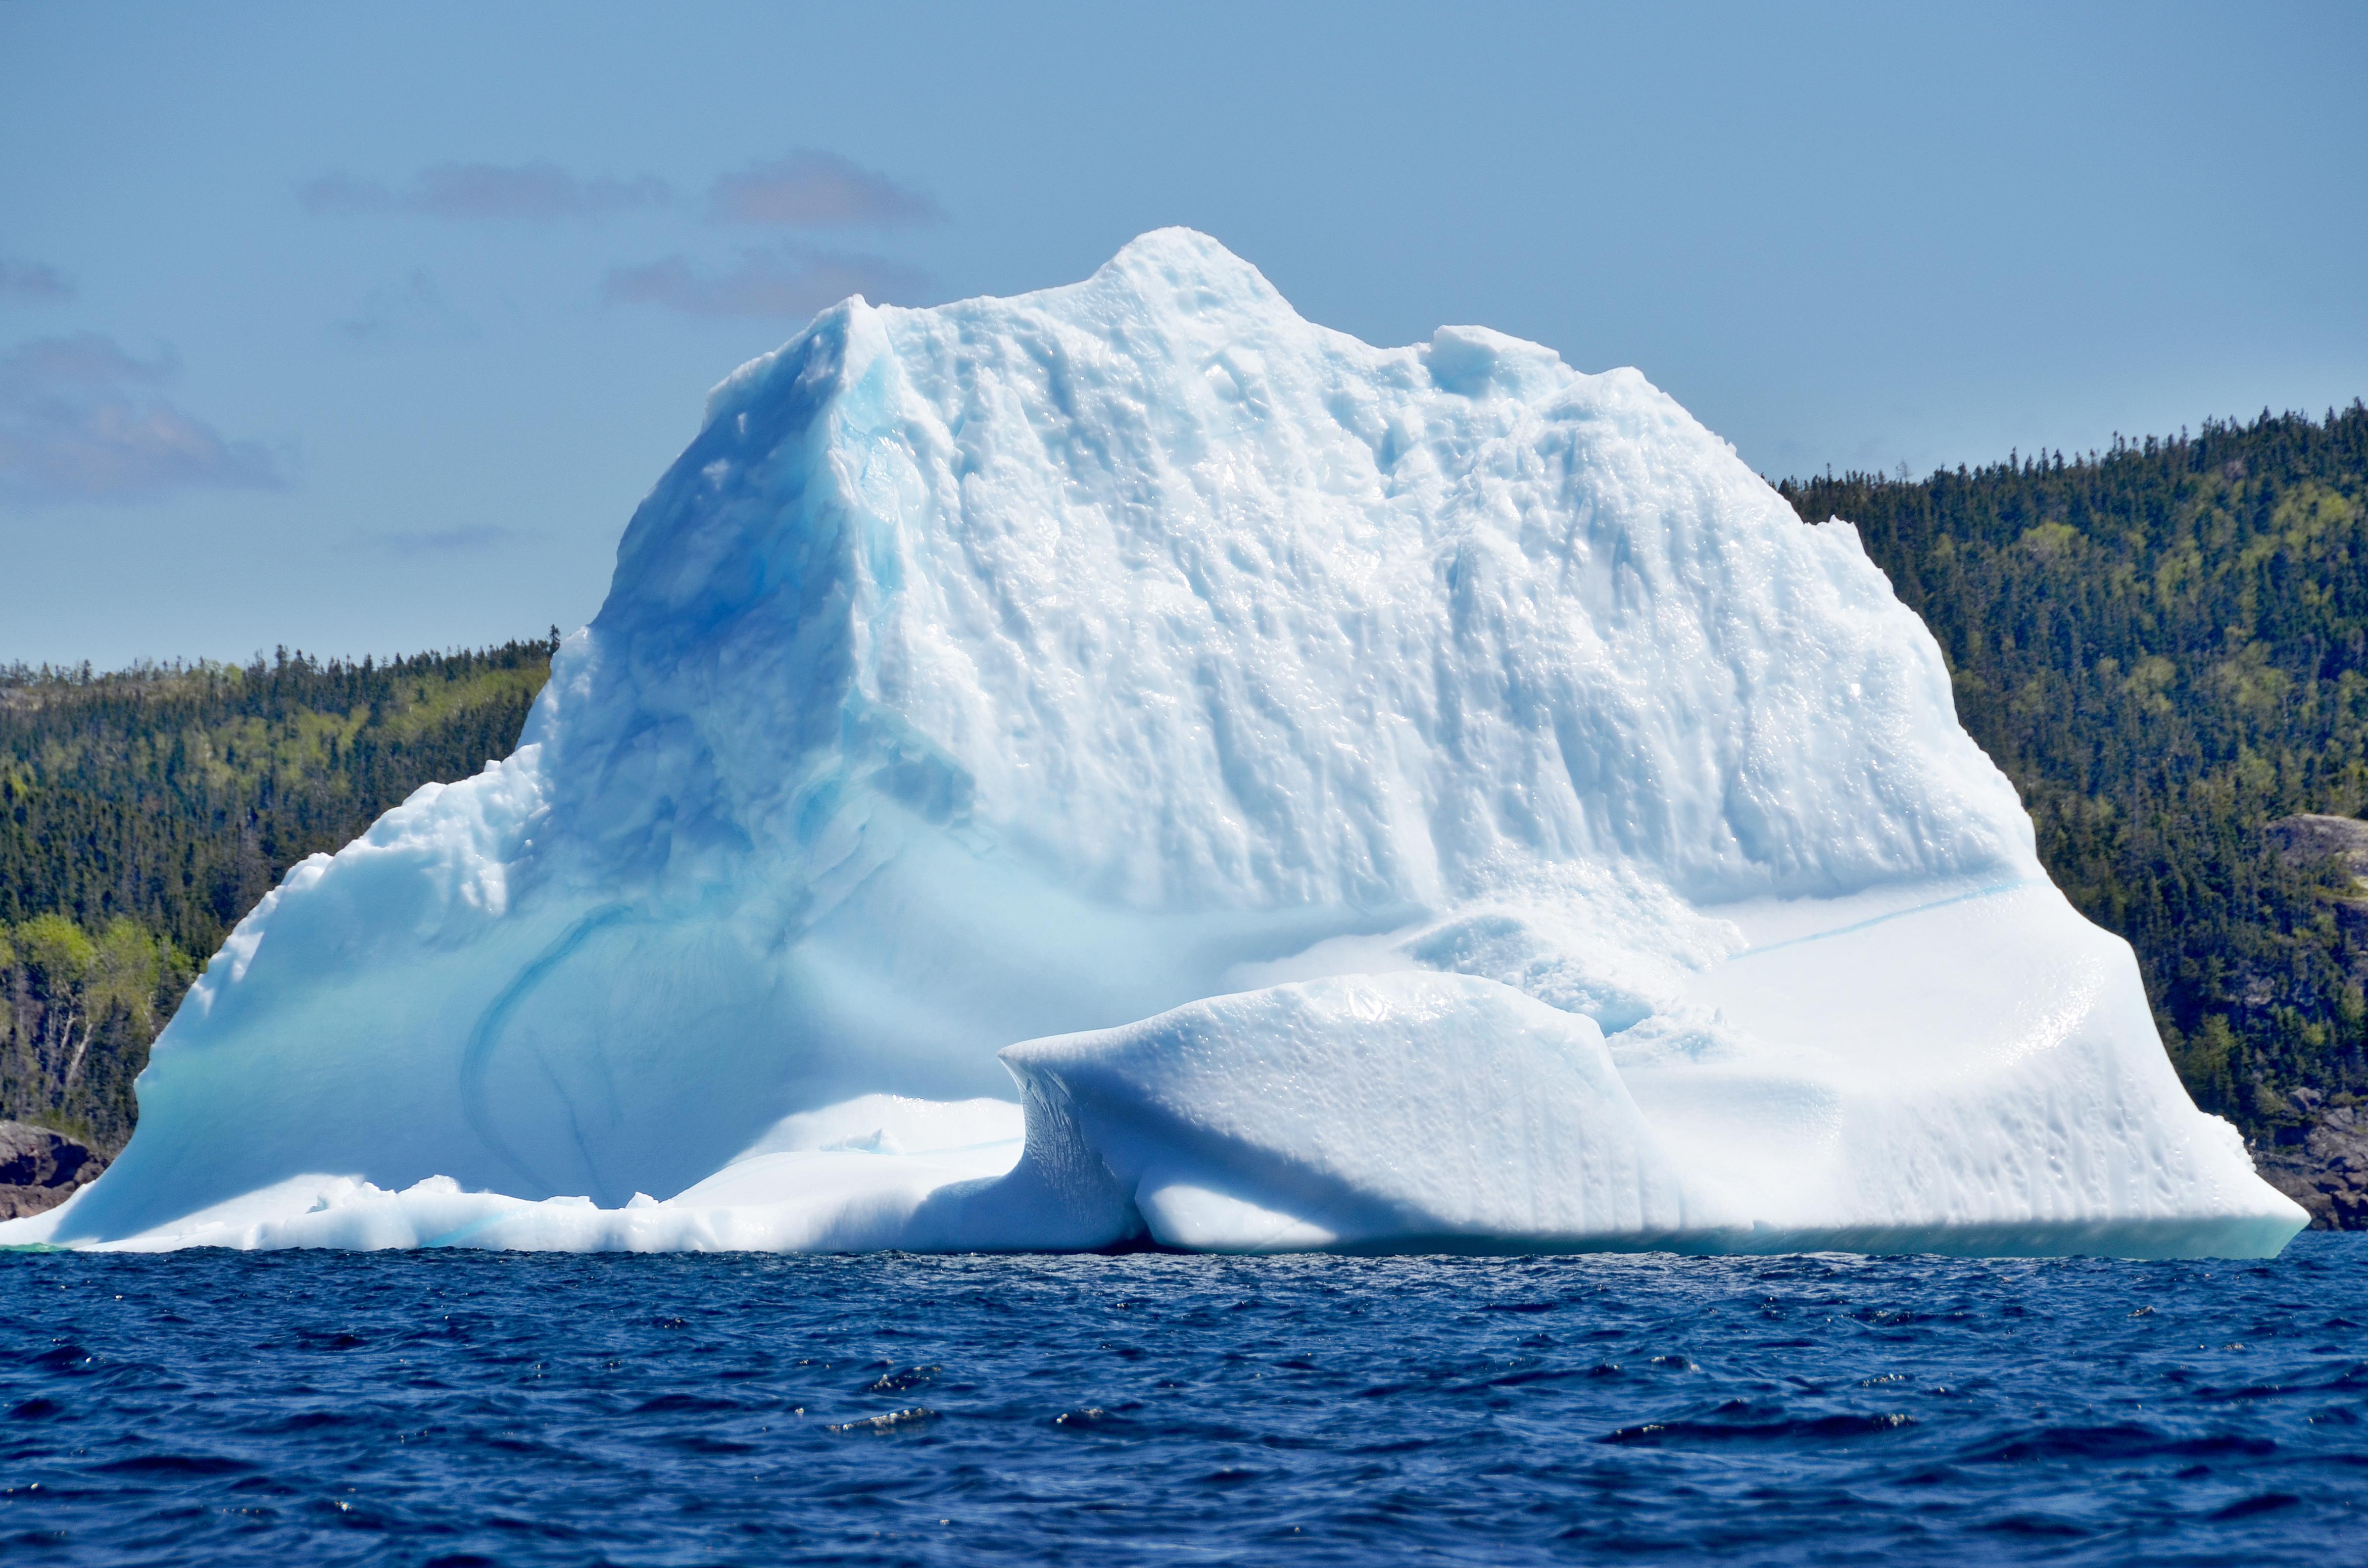 Canada 150 Iceberg